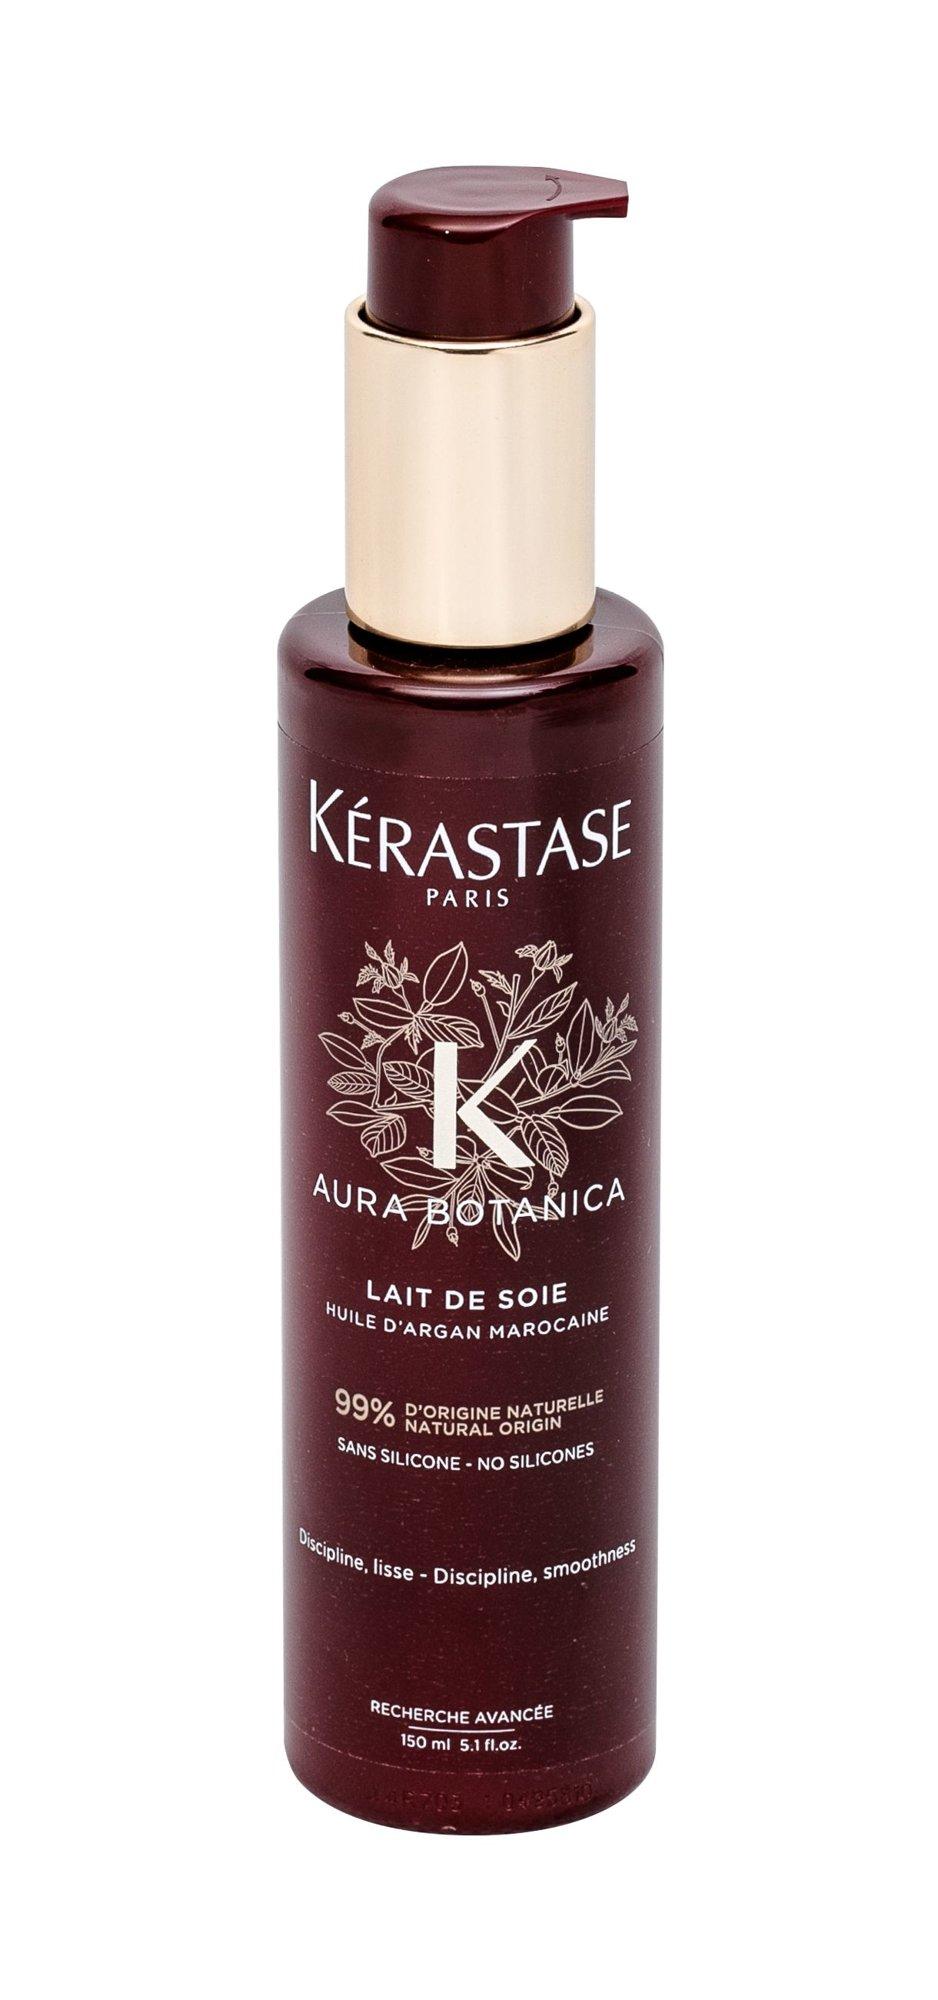 Kérastase Aura Botanica For Definition and Hair Styling 150ml